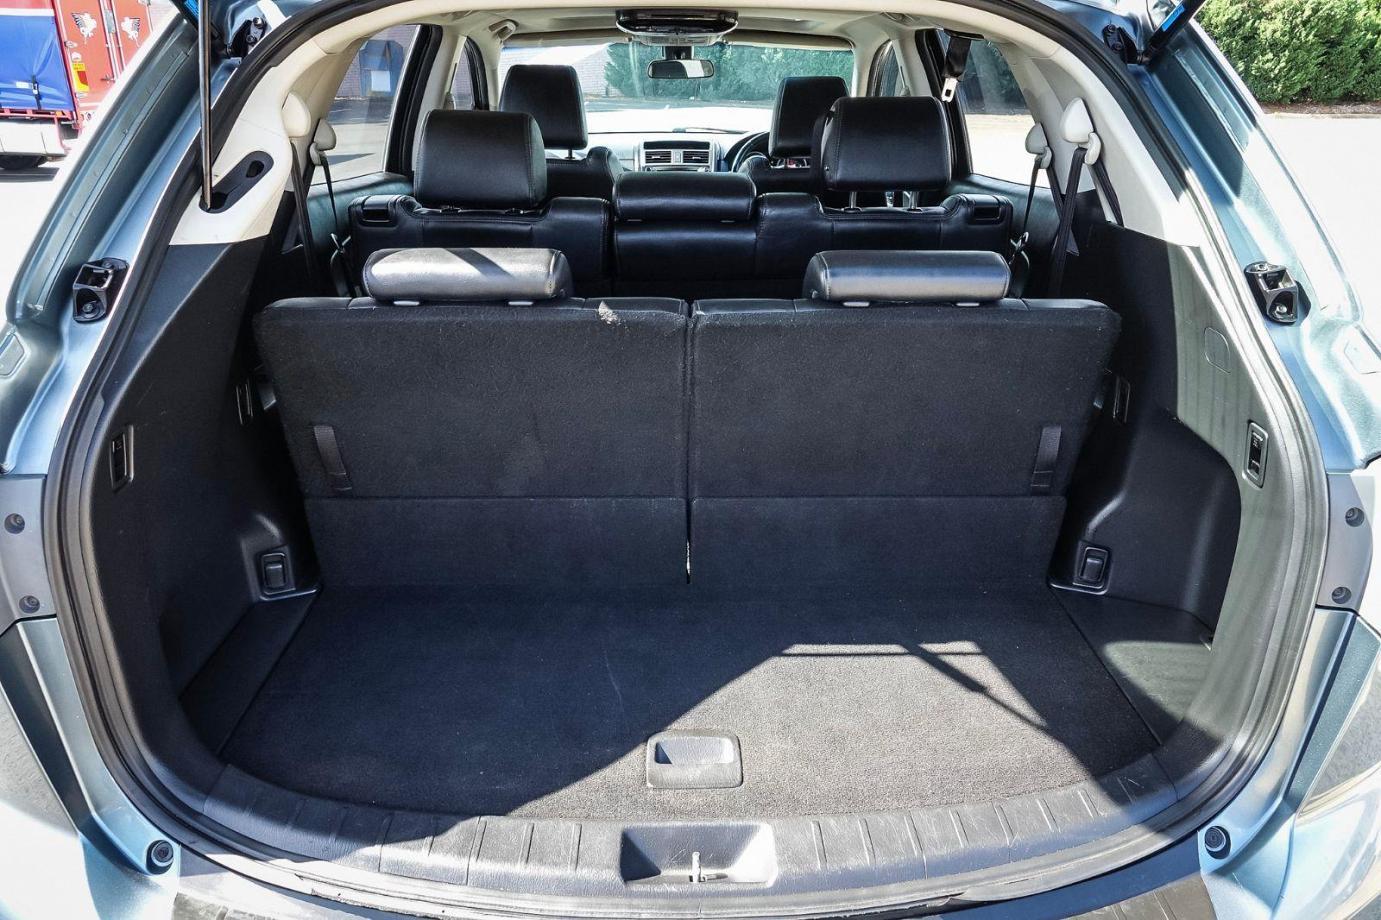 2010 Mazda CX-9 TB10A3 MY10 Grand Touring Wagon 7st 5dr Spts Auto 6sp 4WD 3.7i